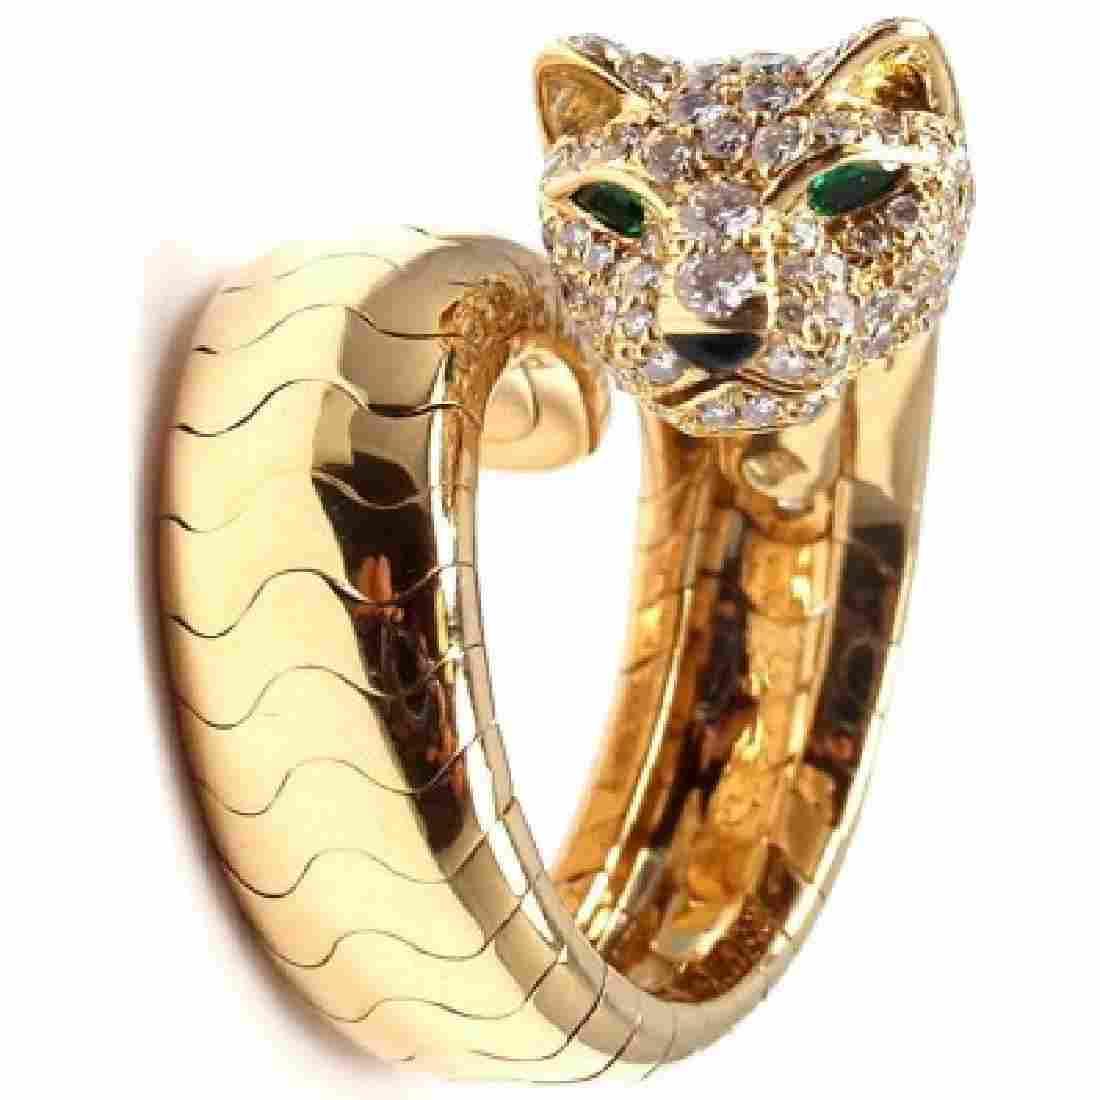 CARTIER PANTHERE 18K DIAMOND EMERALD RING